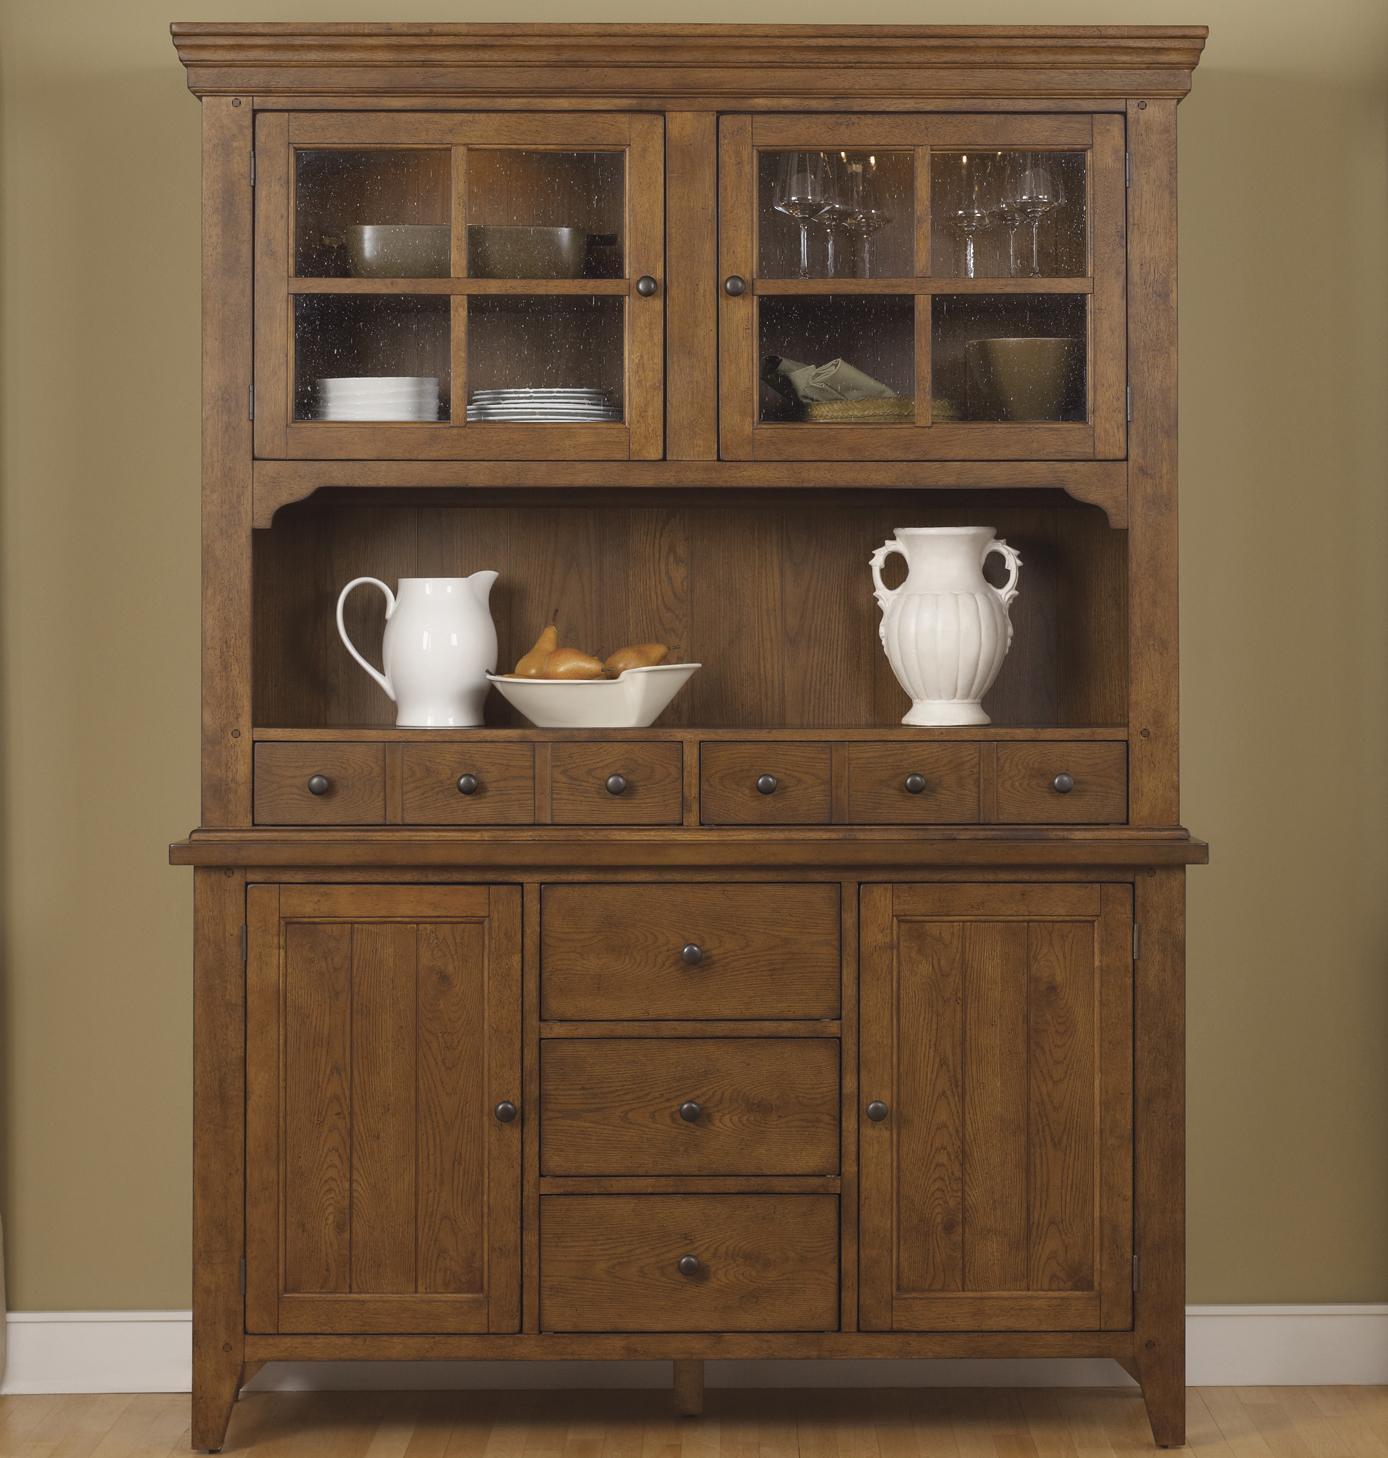 Hearthstone Hutch & Buffet by Liberty Furniture at Lapeer Furniture & Mattress Center